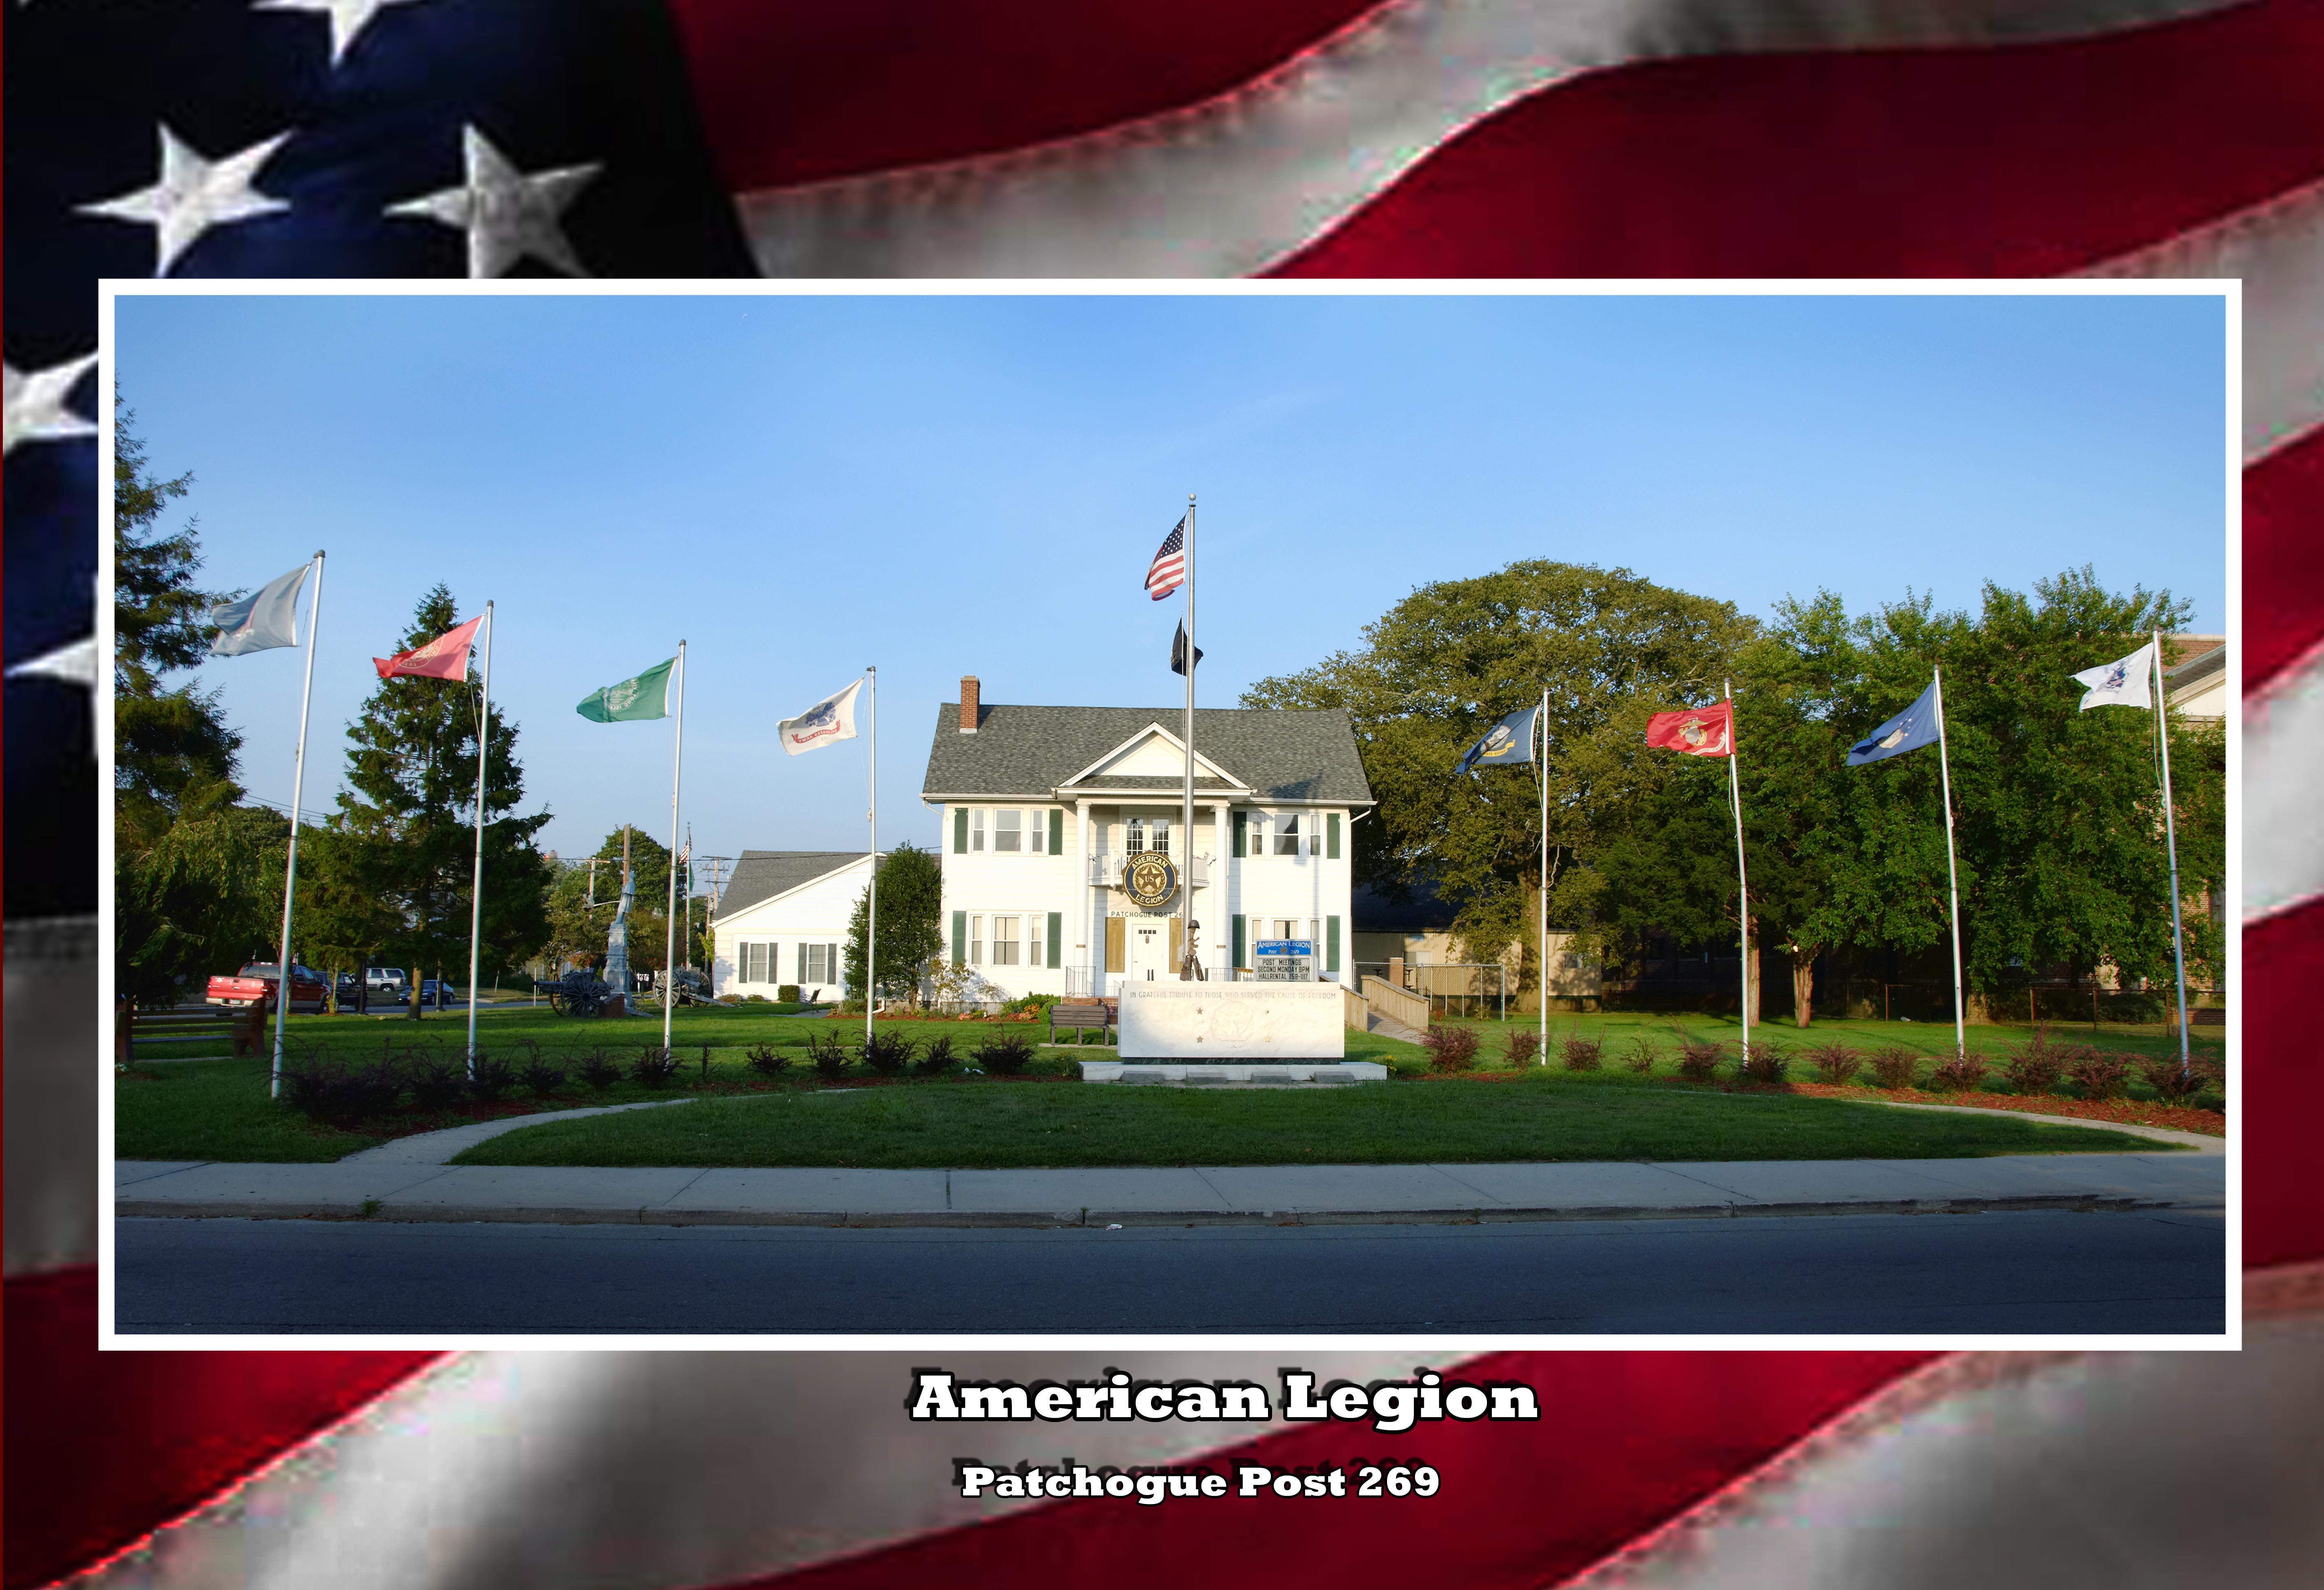 American Legion Post 269